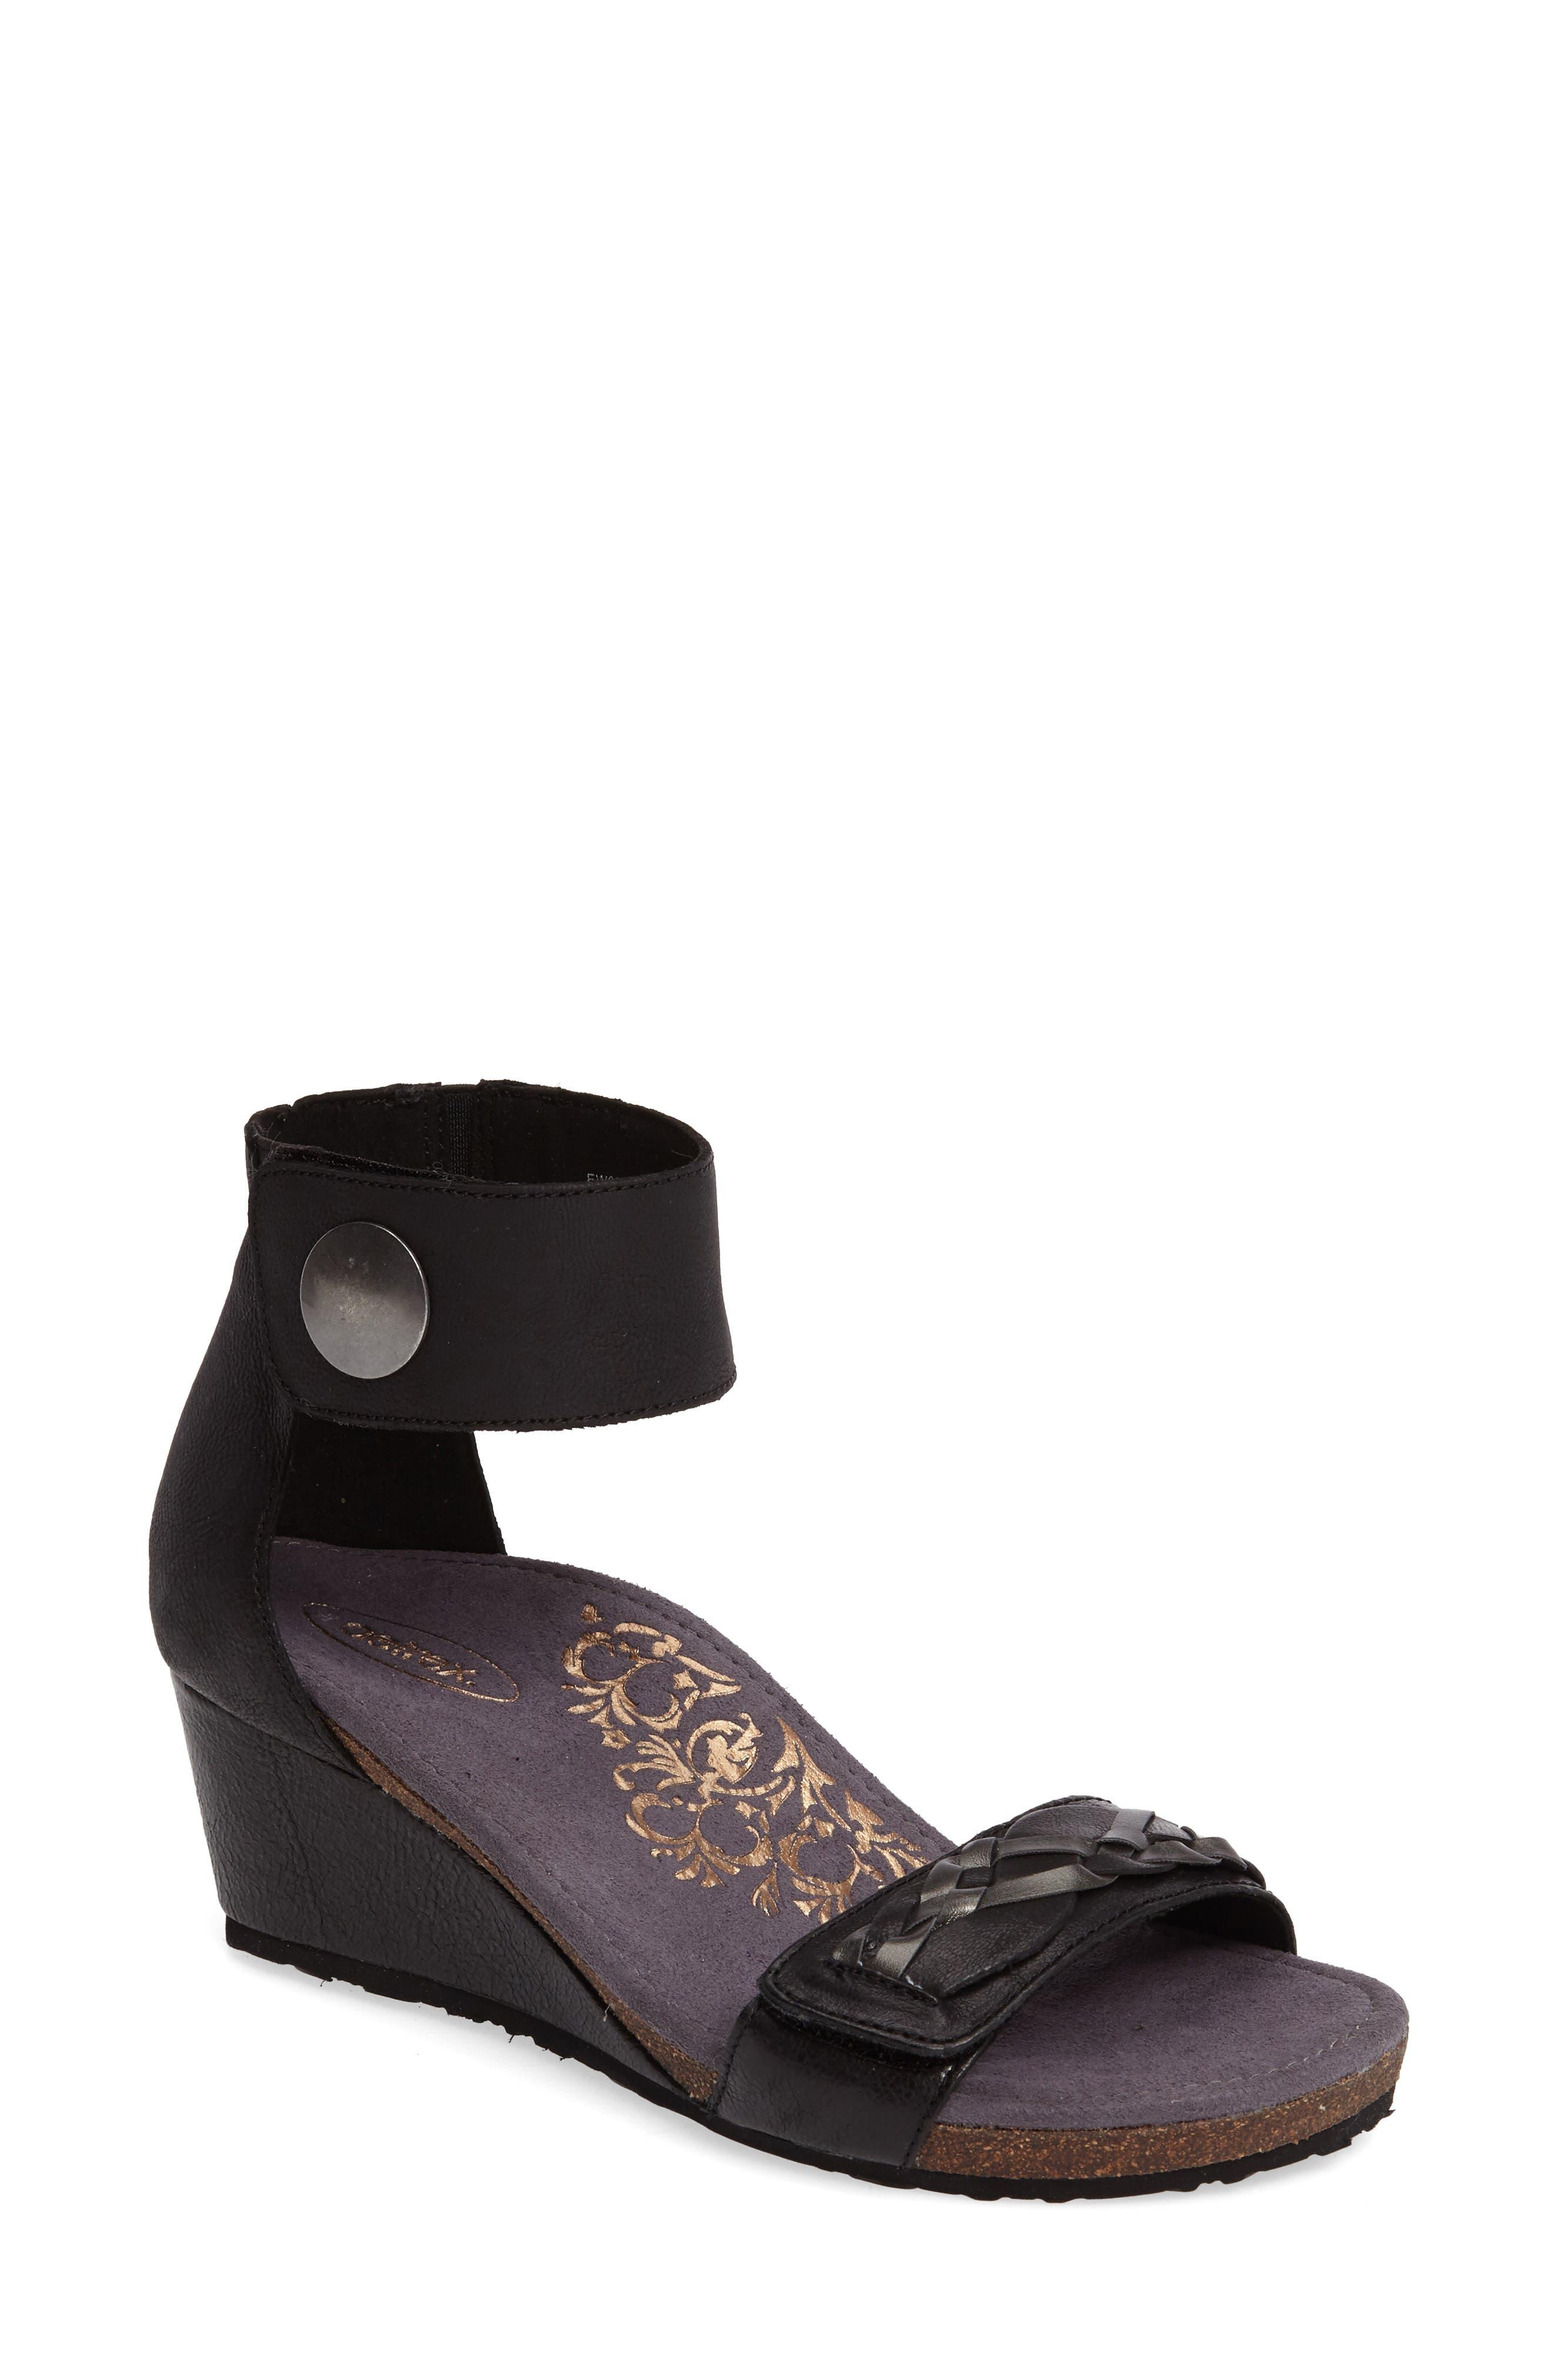 Aetrex Becca Cuff Wedge Sandal (Women)